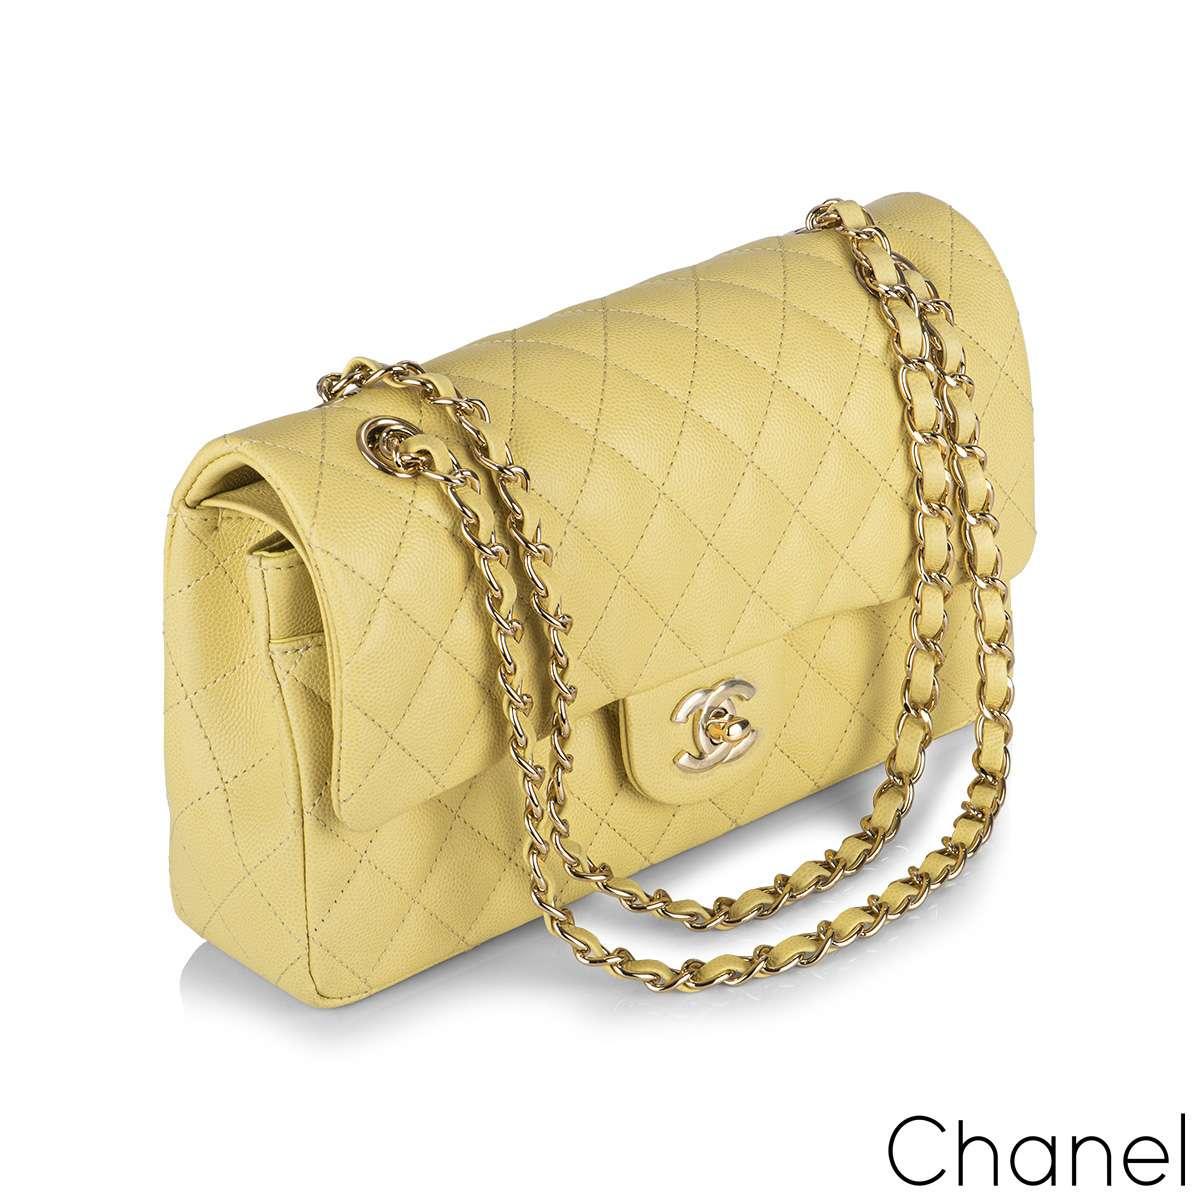 Chanel Yellow Caviar Medium Classic Double Flap Bag